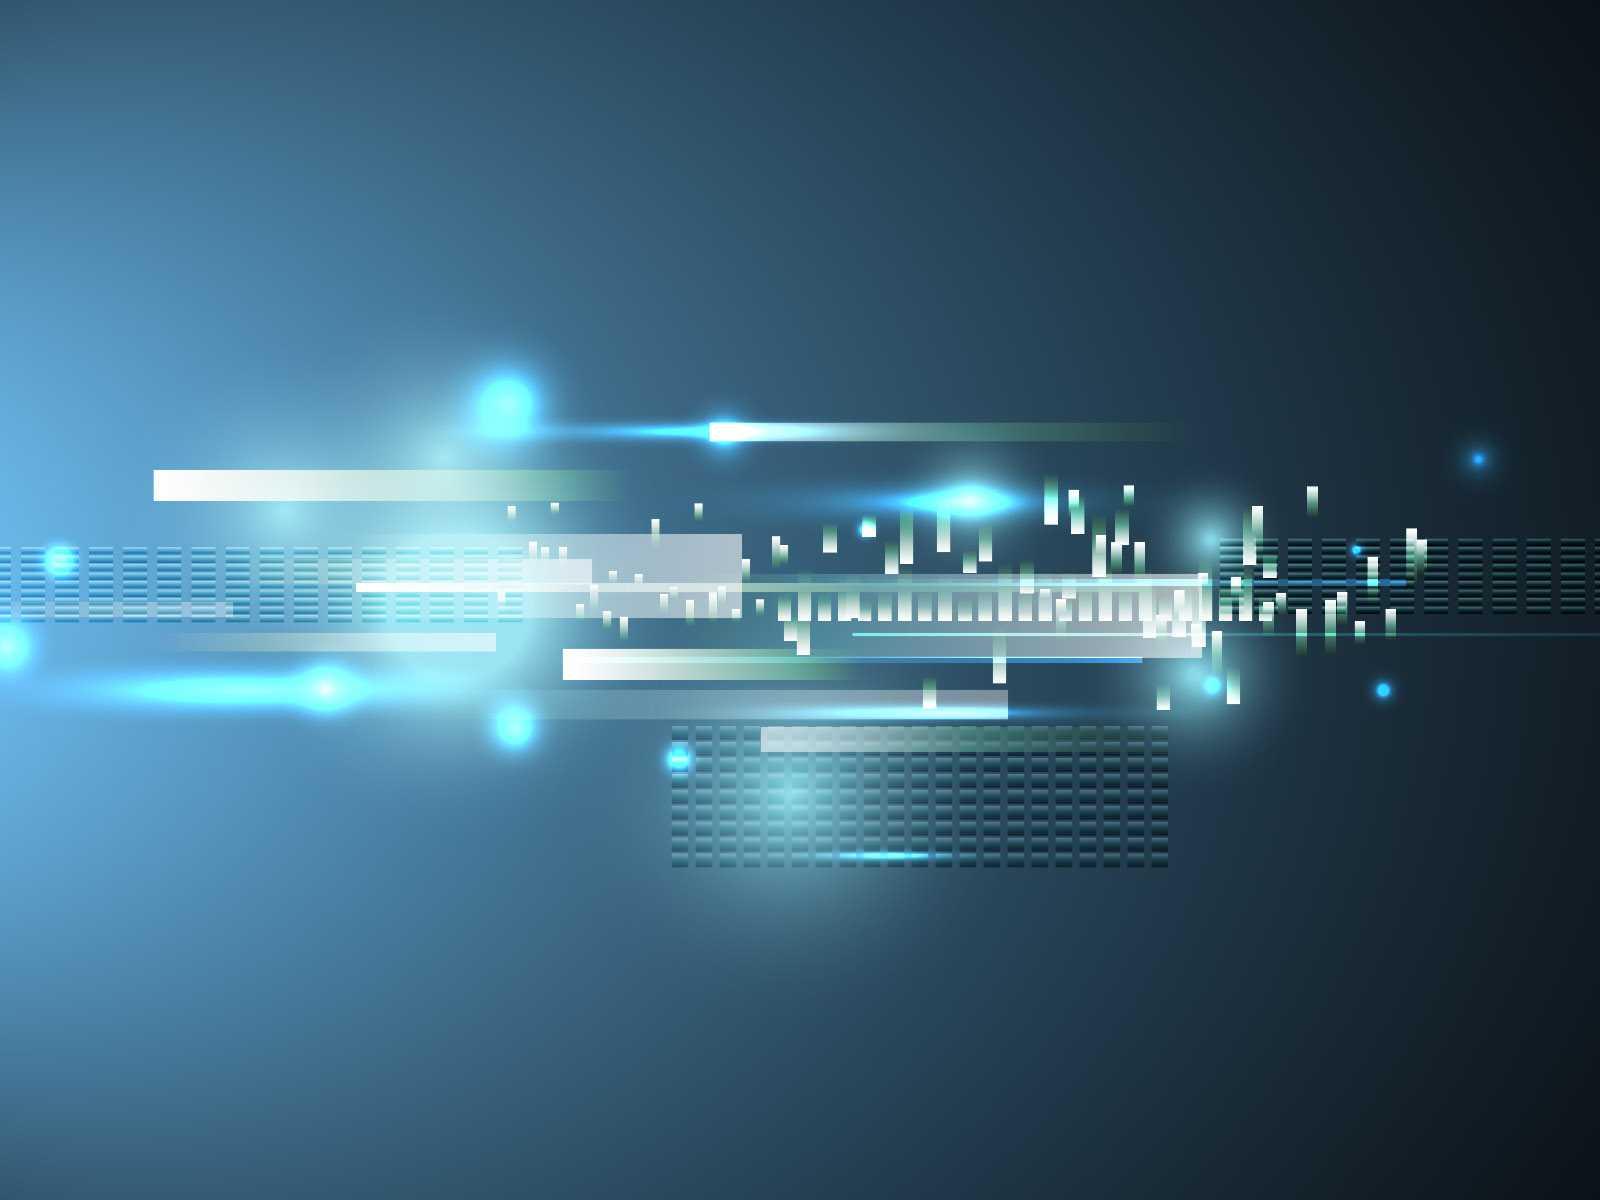 Telecom Industry Tech Powerpoint Templates - Industrial within High Tech Powerpoint Template